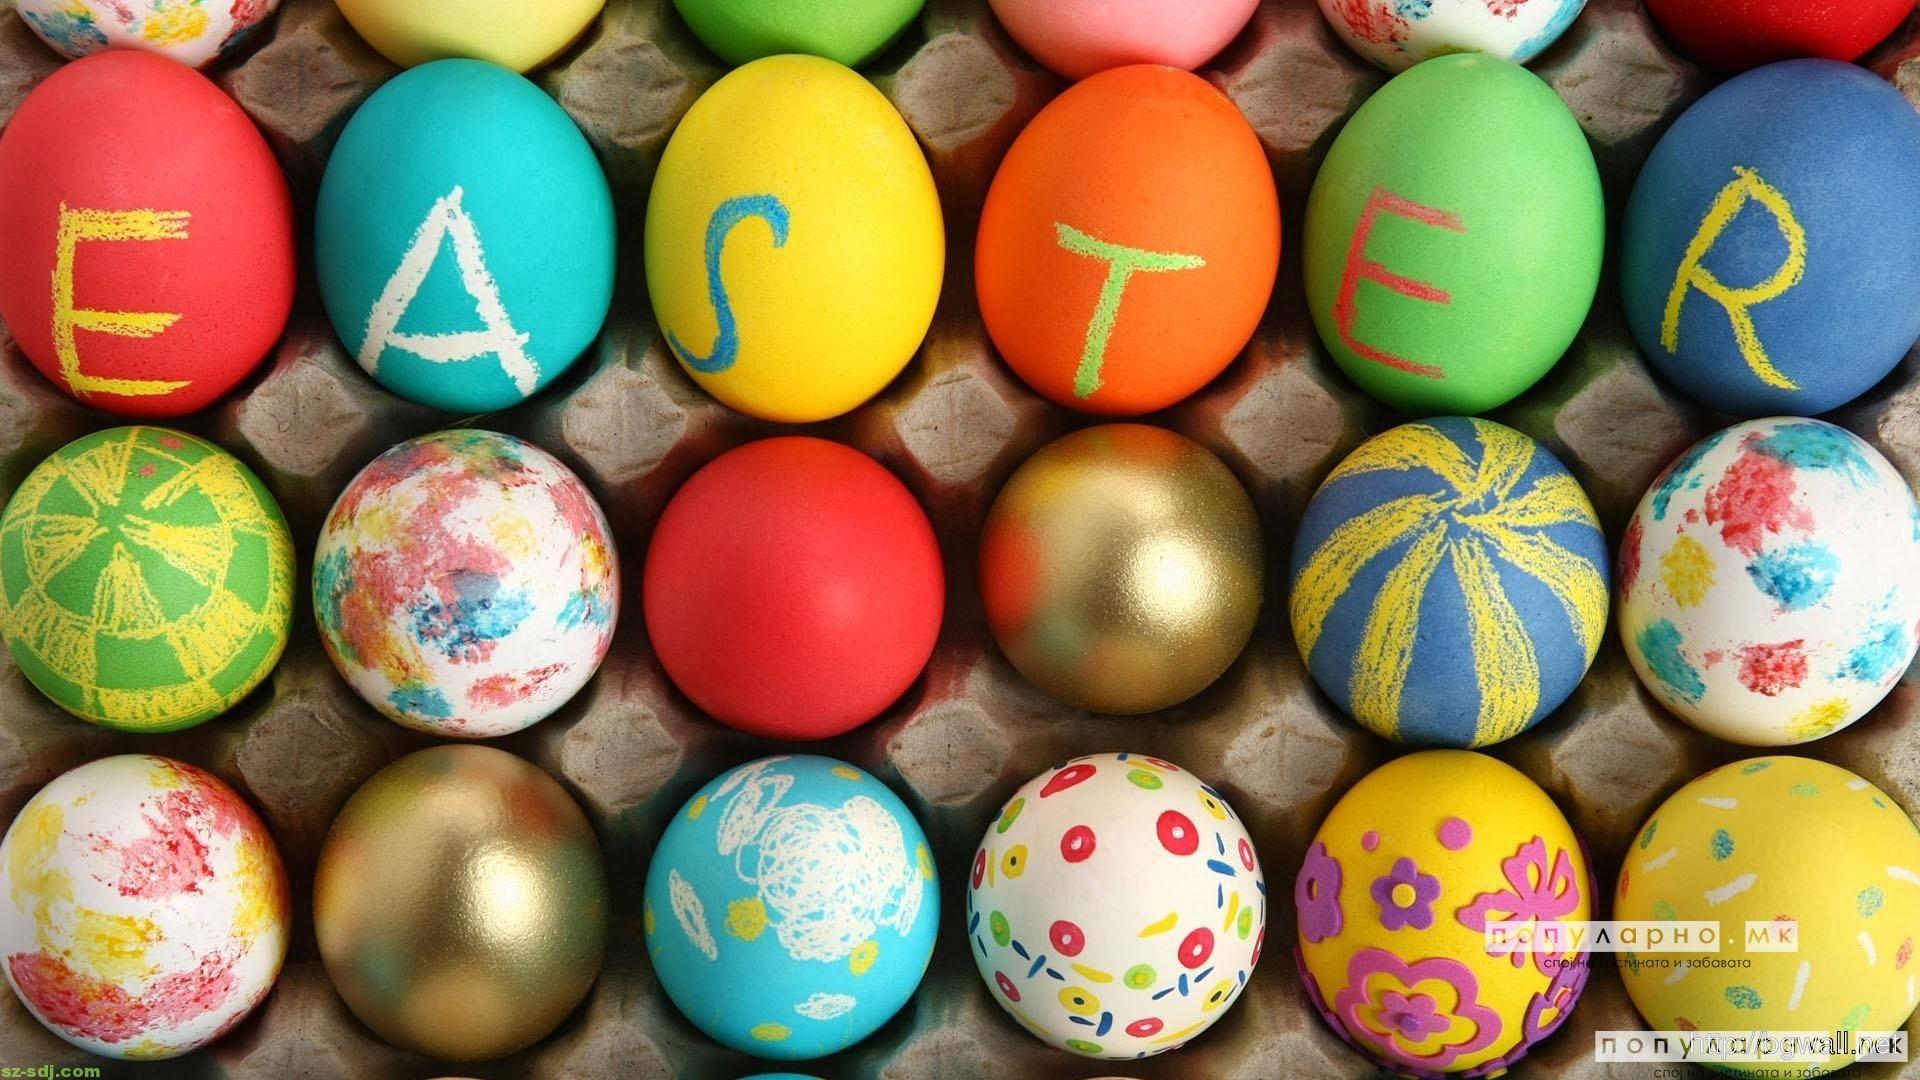 Велигденските симболи и традиции ширум светот